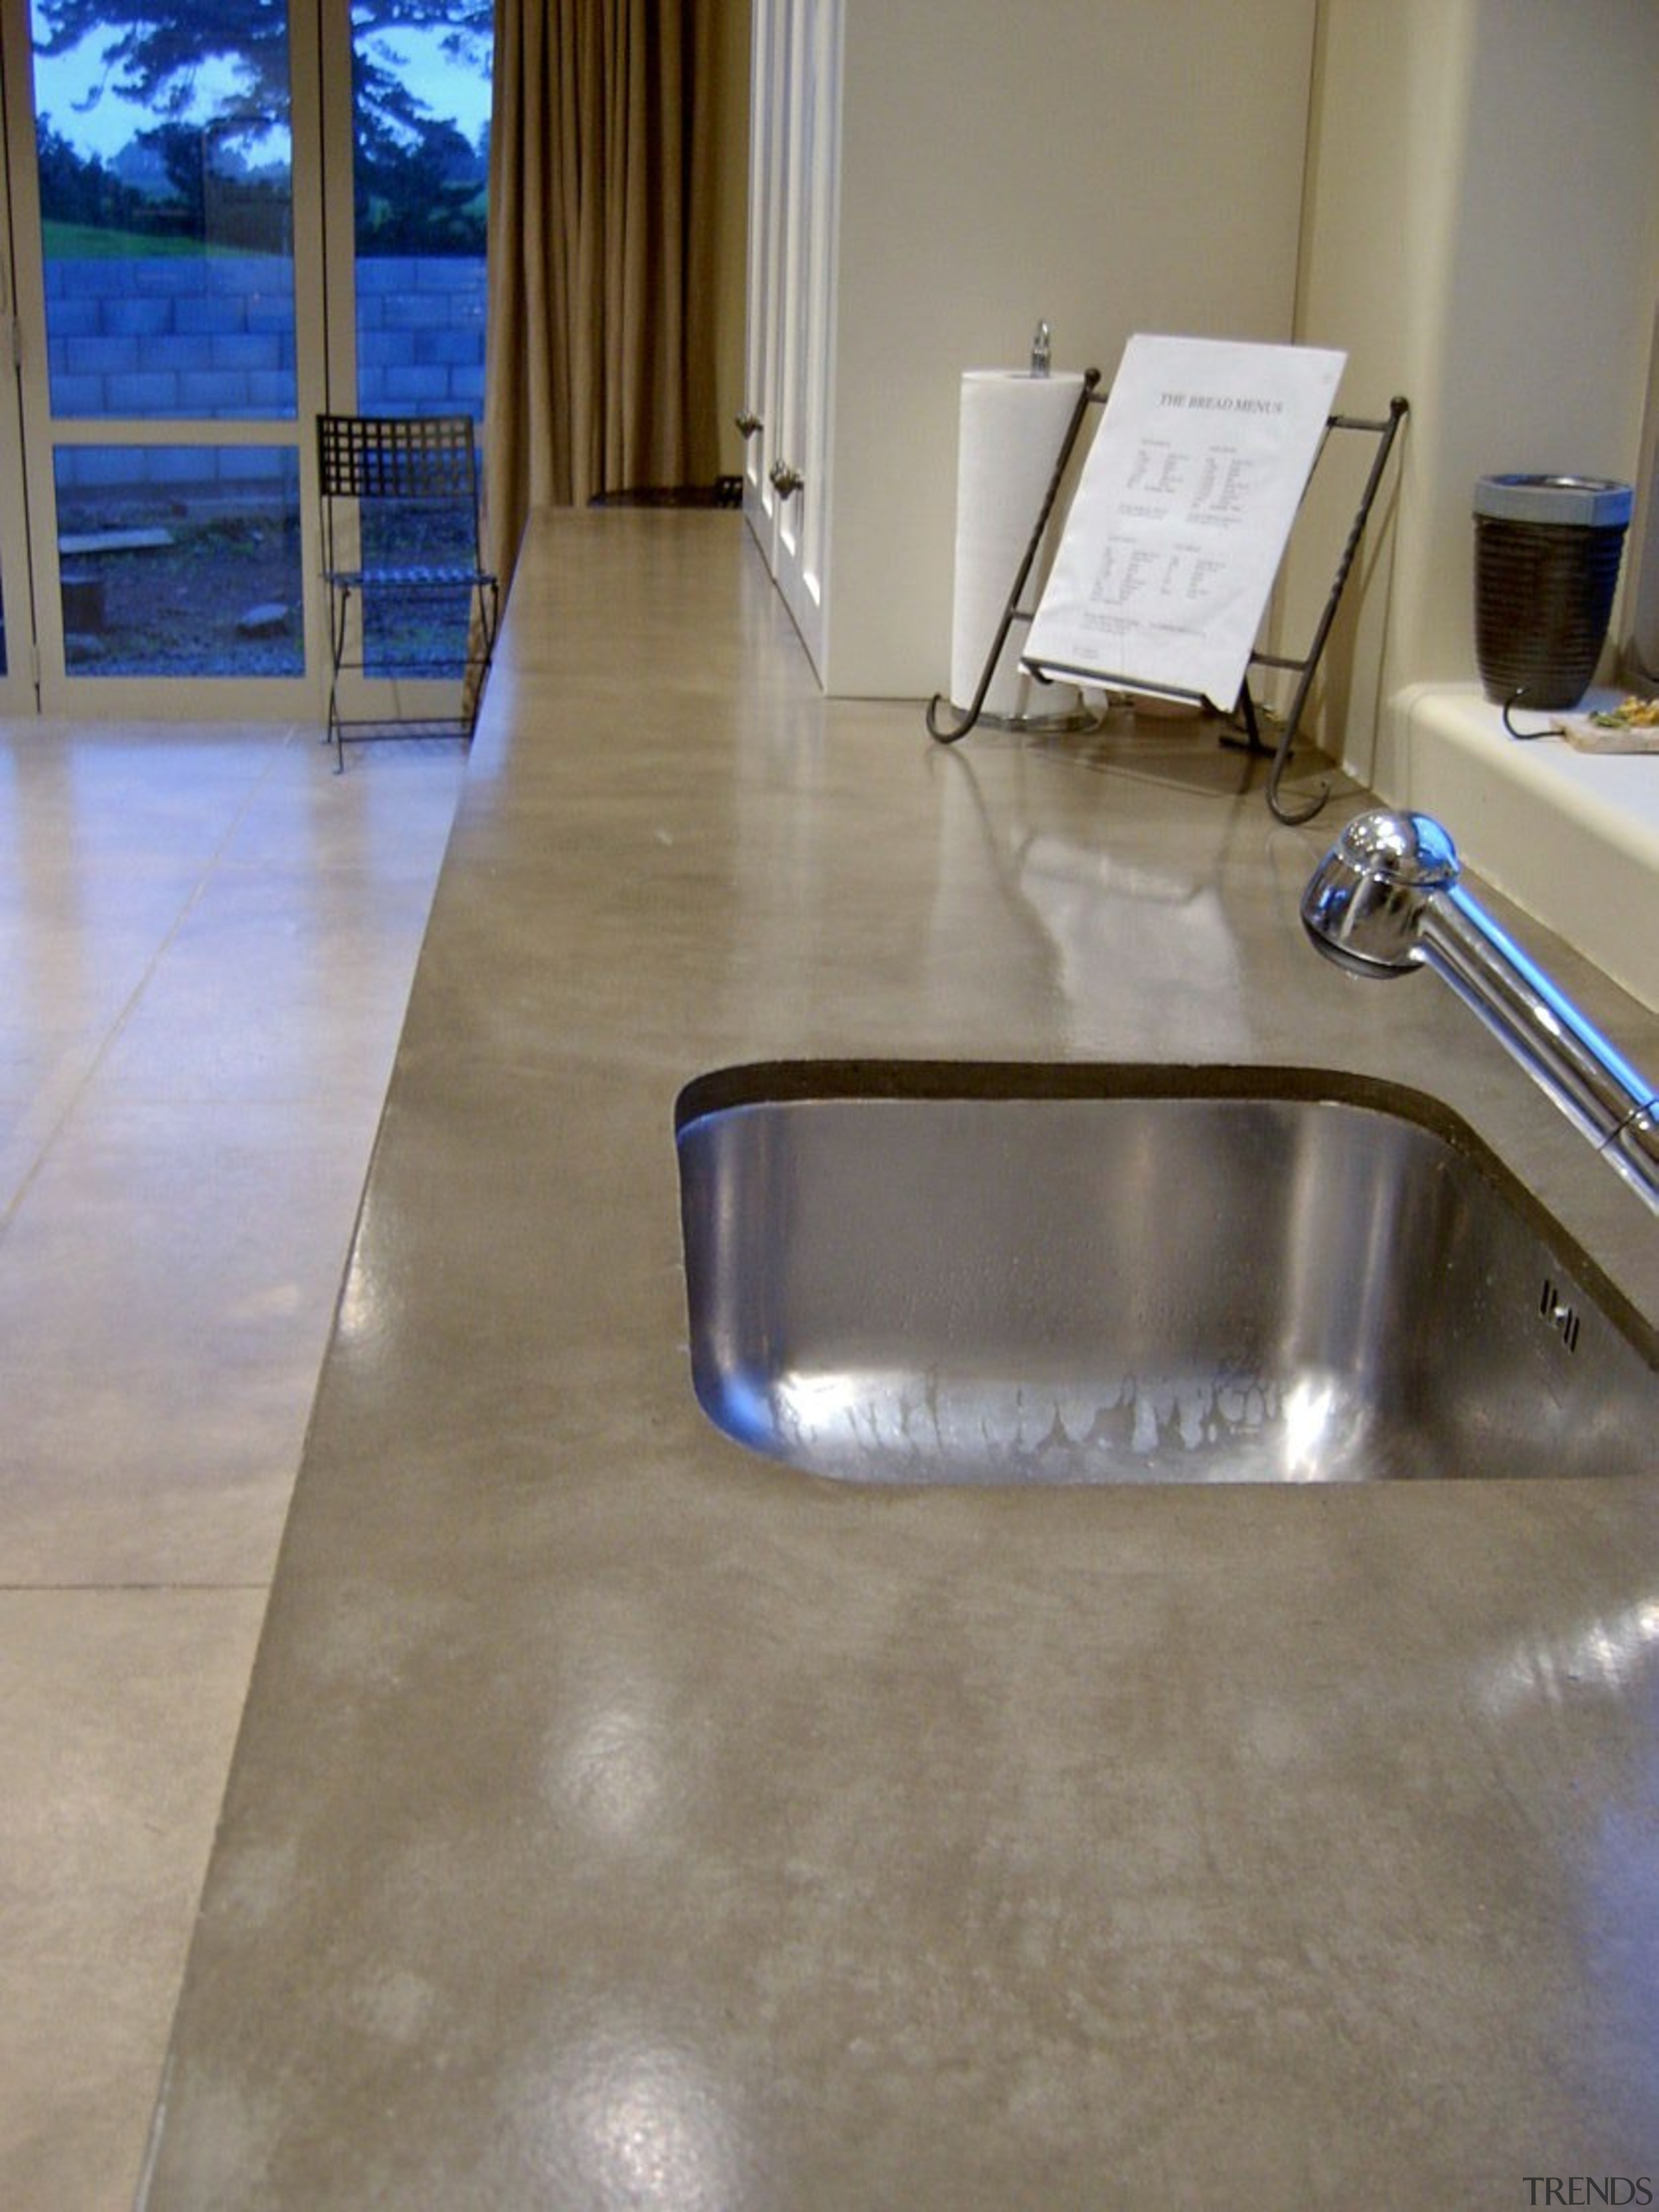 Colourmix 49 - Colourmix_49 - countertop | floor countertop, floor, flooring, hardwood, tile, gray